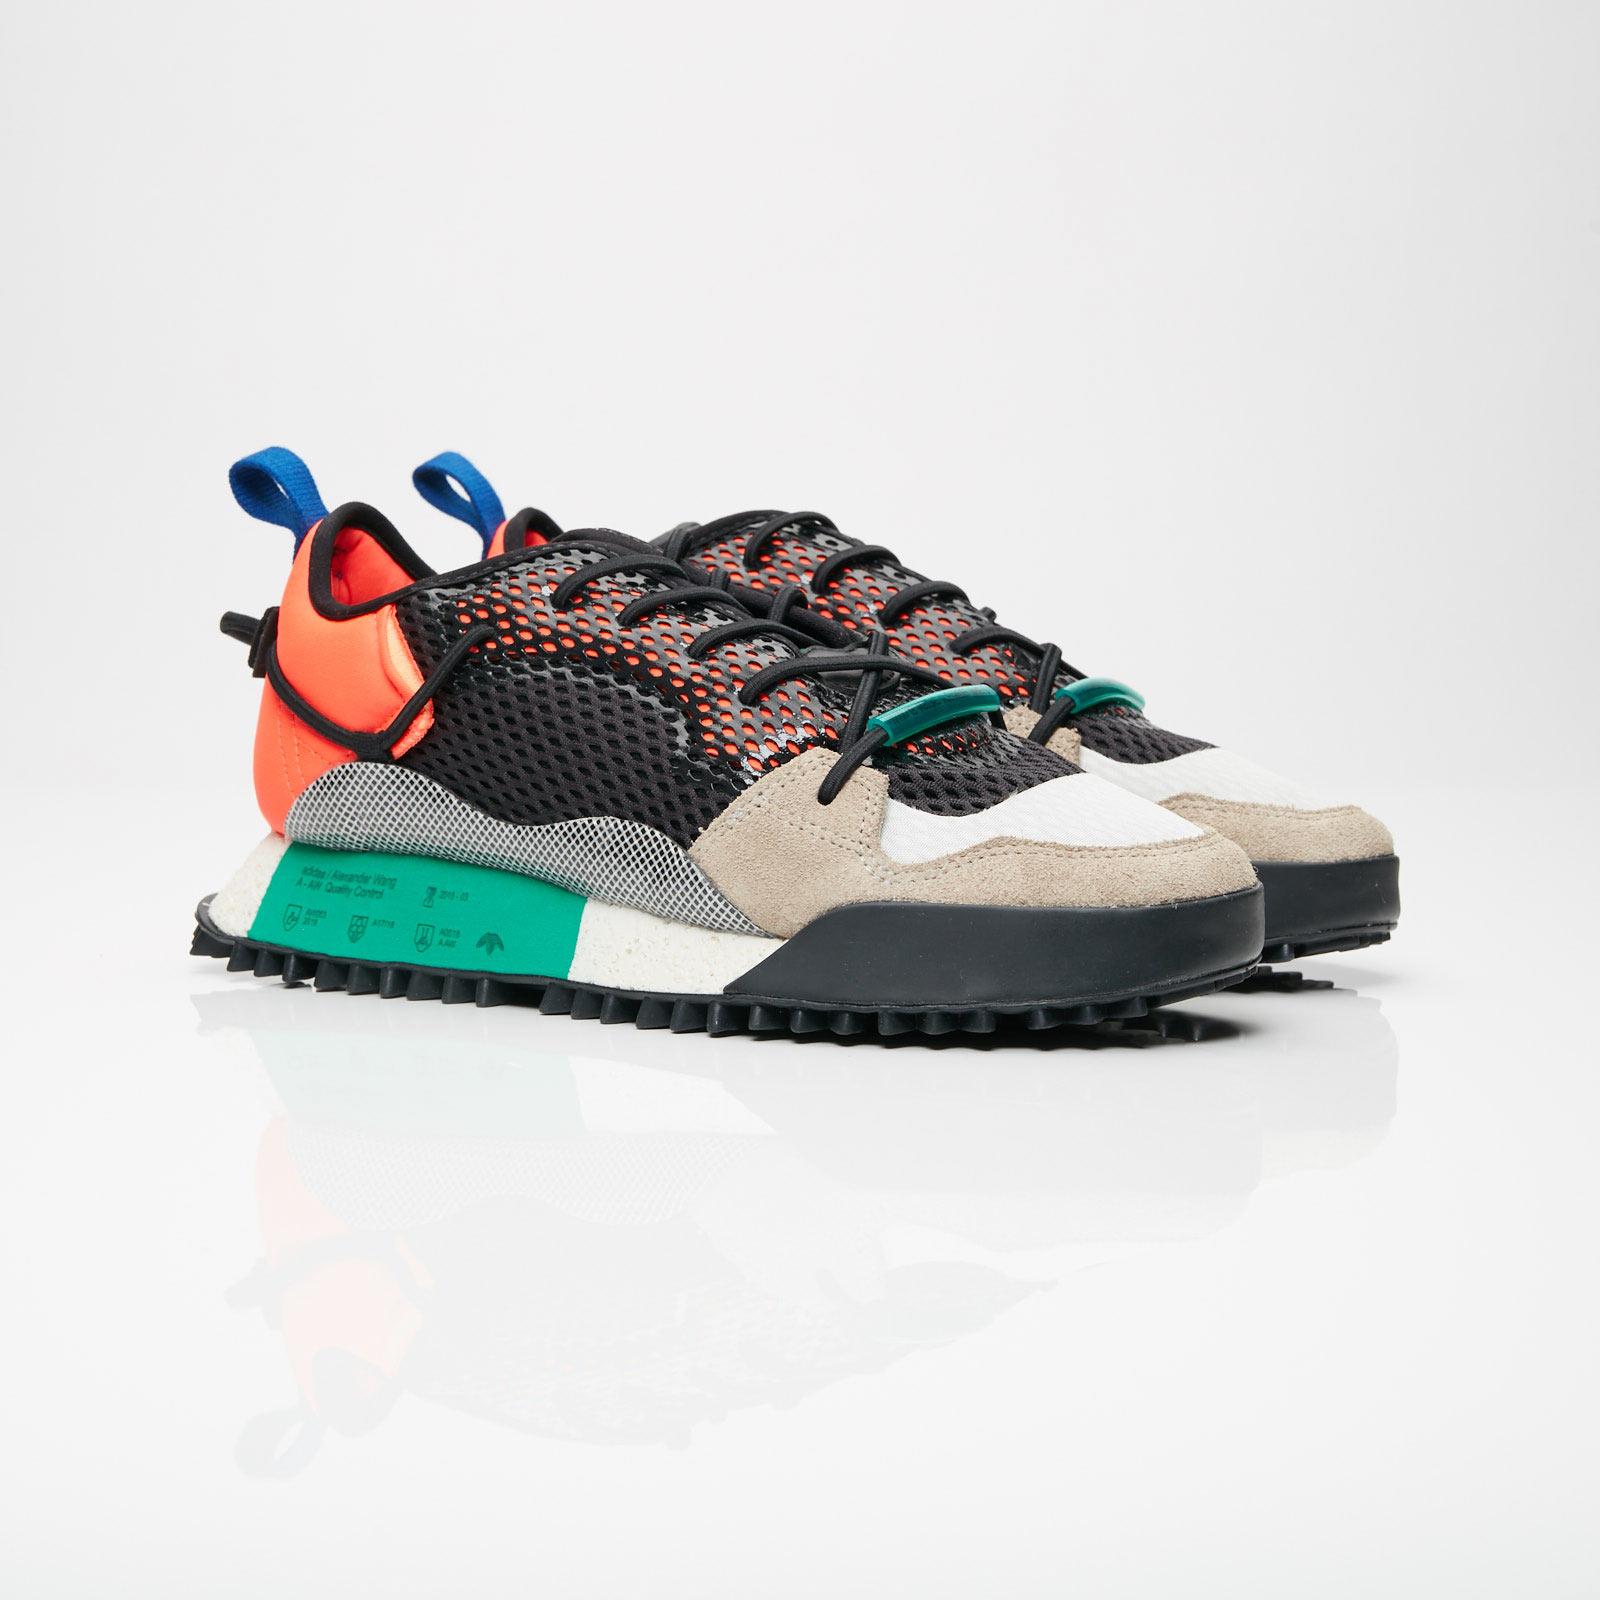 X Sneakersnstuff Adidas Run Alexander Wang Aq1233 Reissue QCBoerWdx